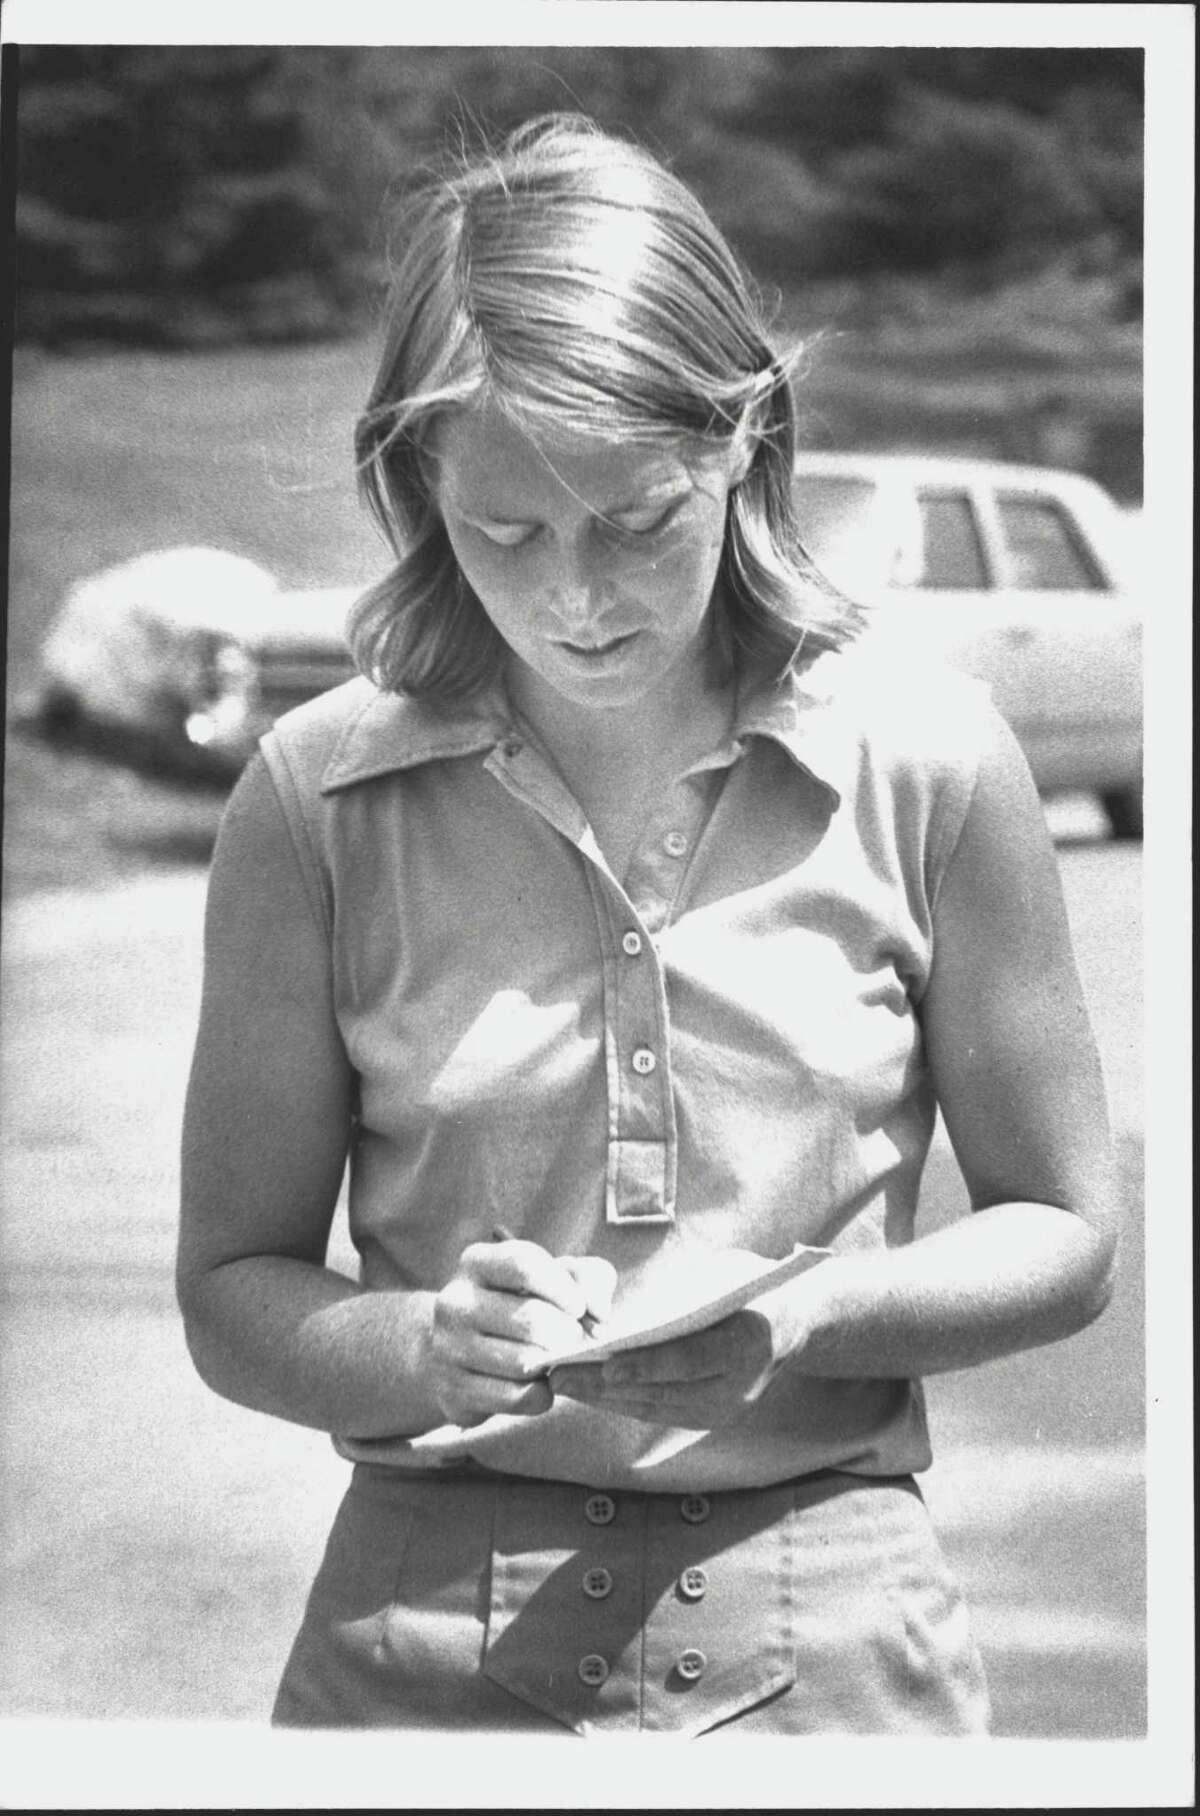 Sharyn Heliseva checks scorecard during round of golf in New York. Undated (Times Union Archive)